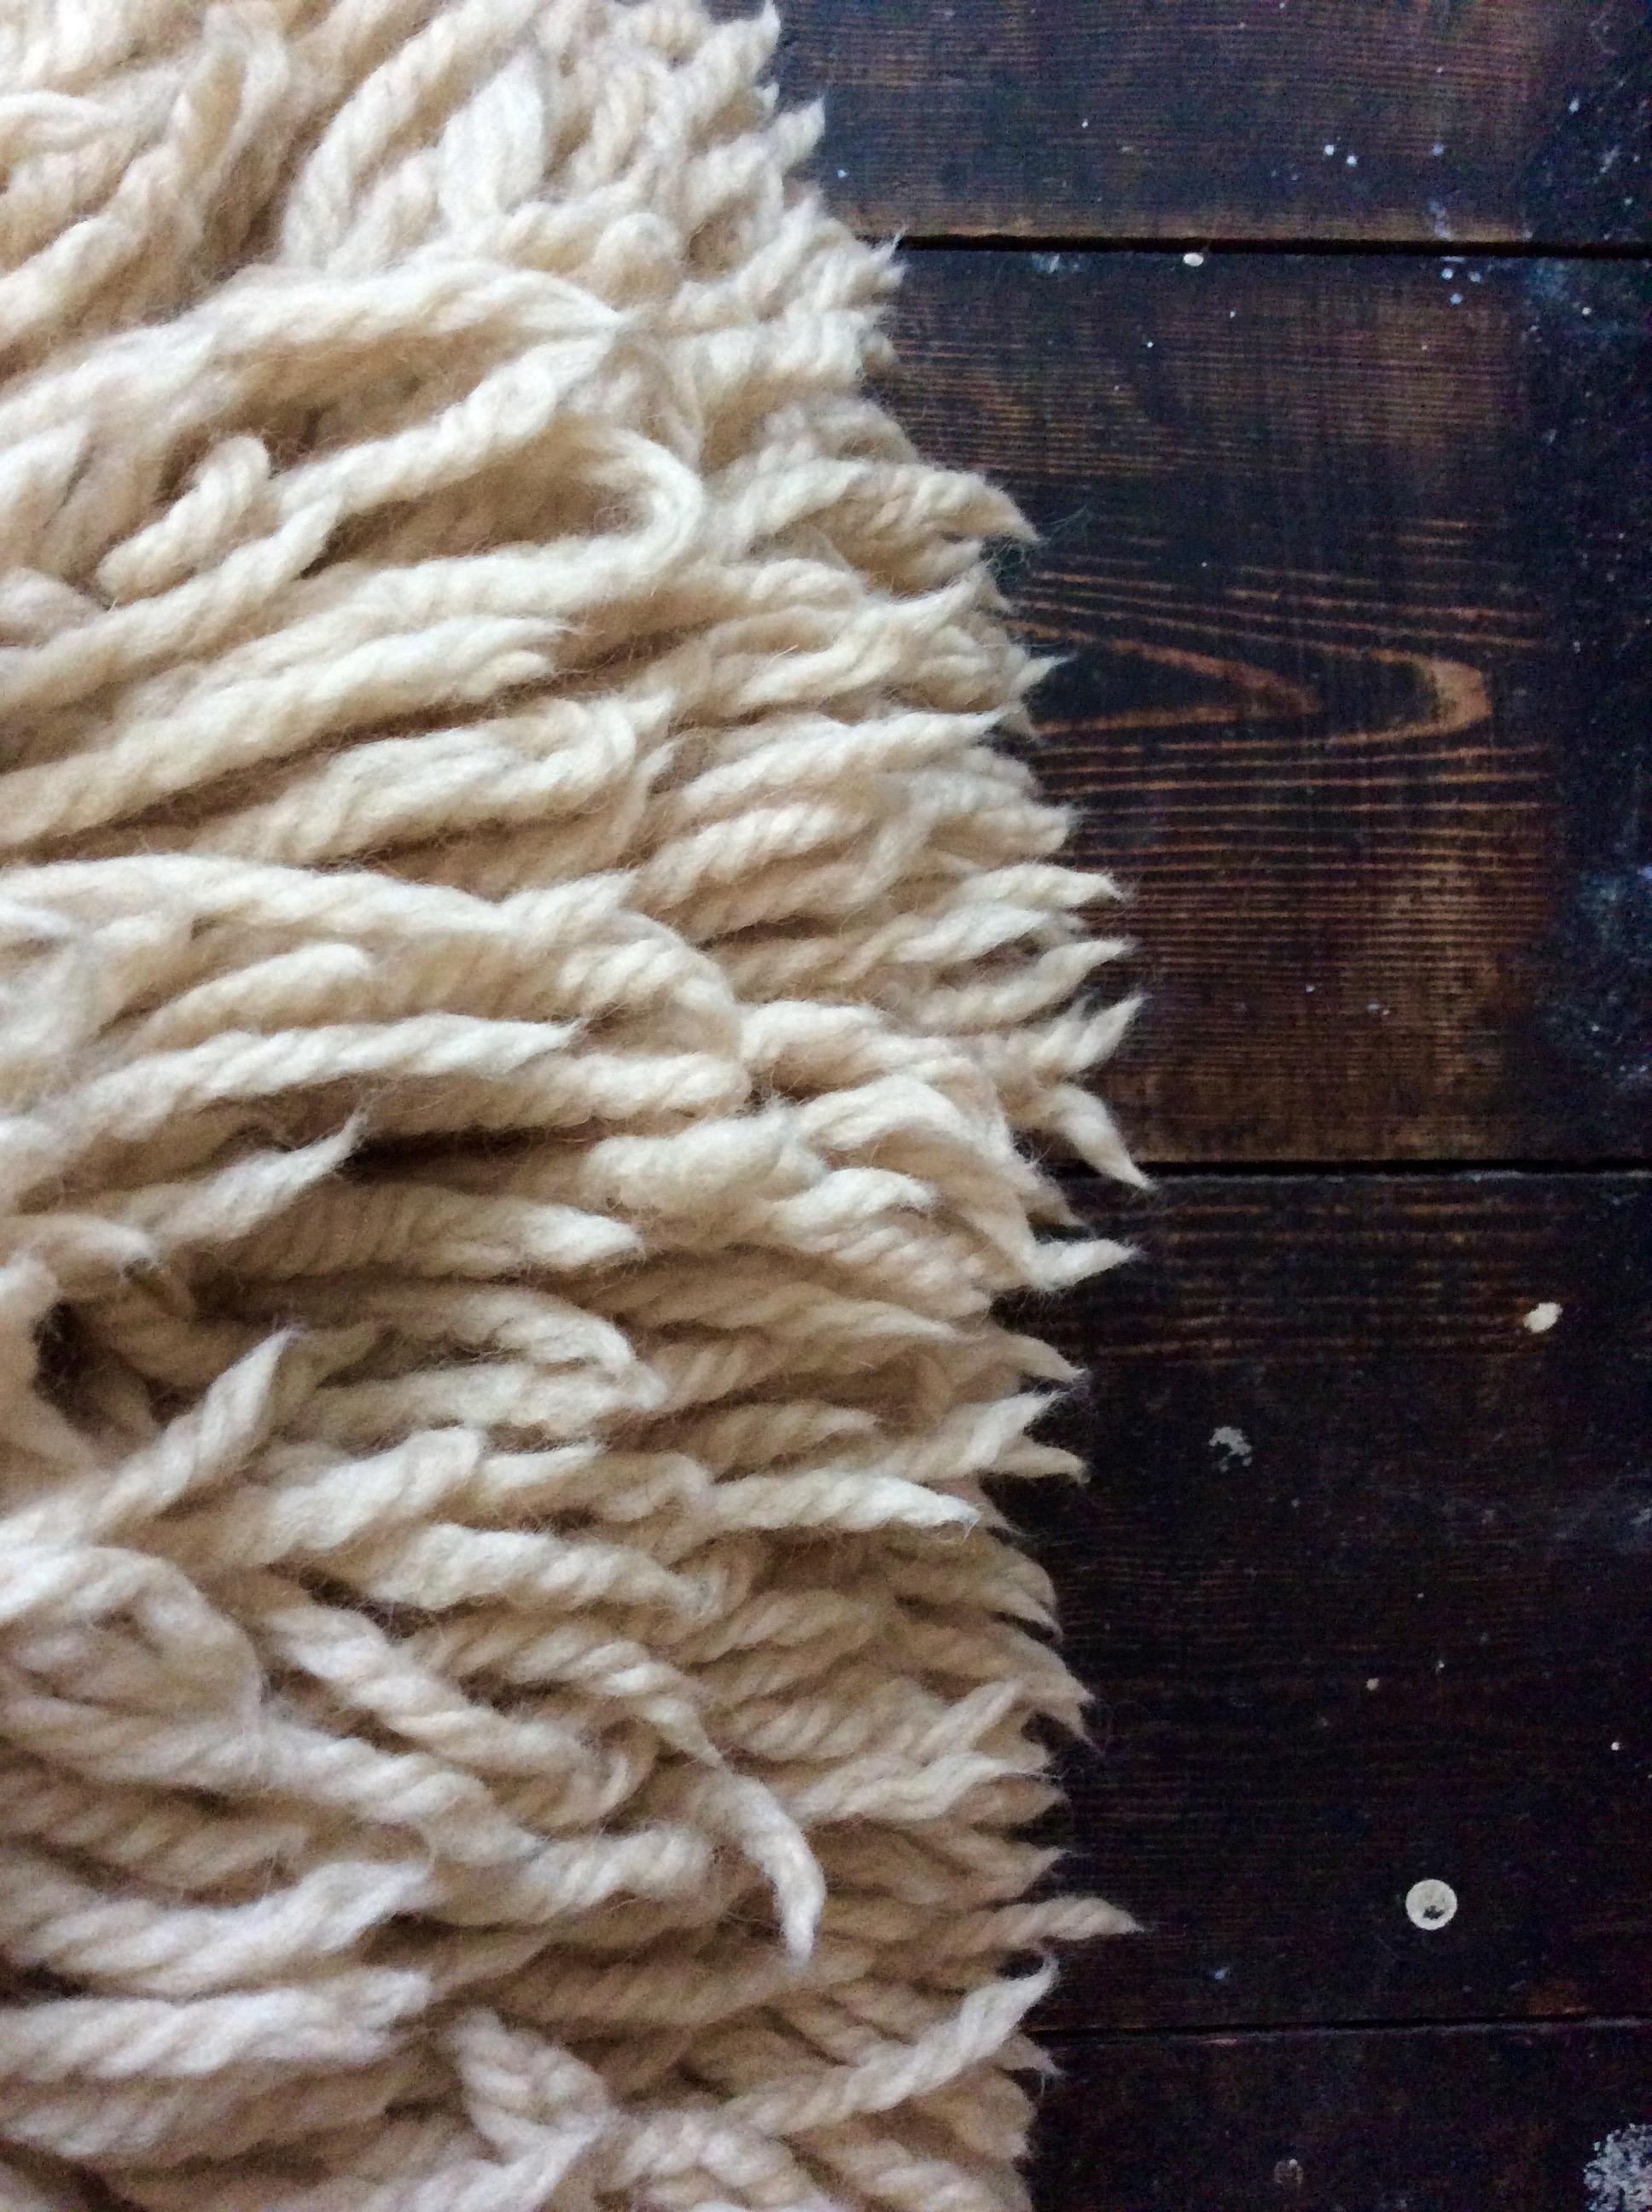 Kate Jones Shaggy cushion closeup.jpg